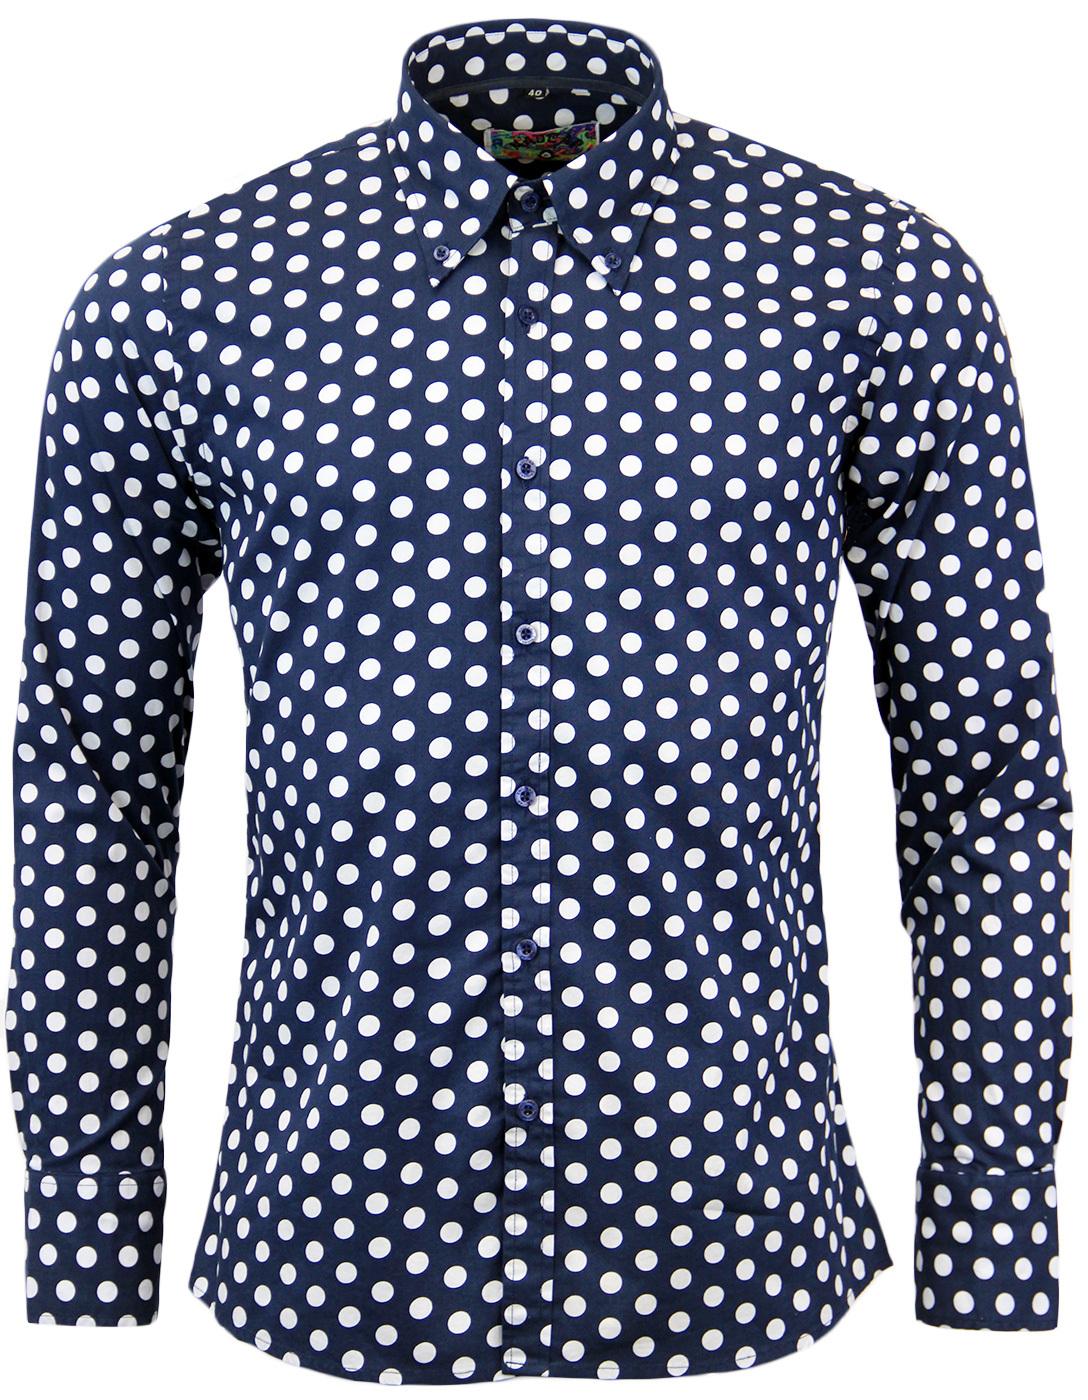 Penny Dot Lane MADCAP ENGLAND Retro 60s Mod Shirt